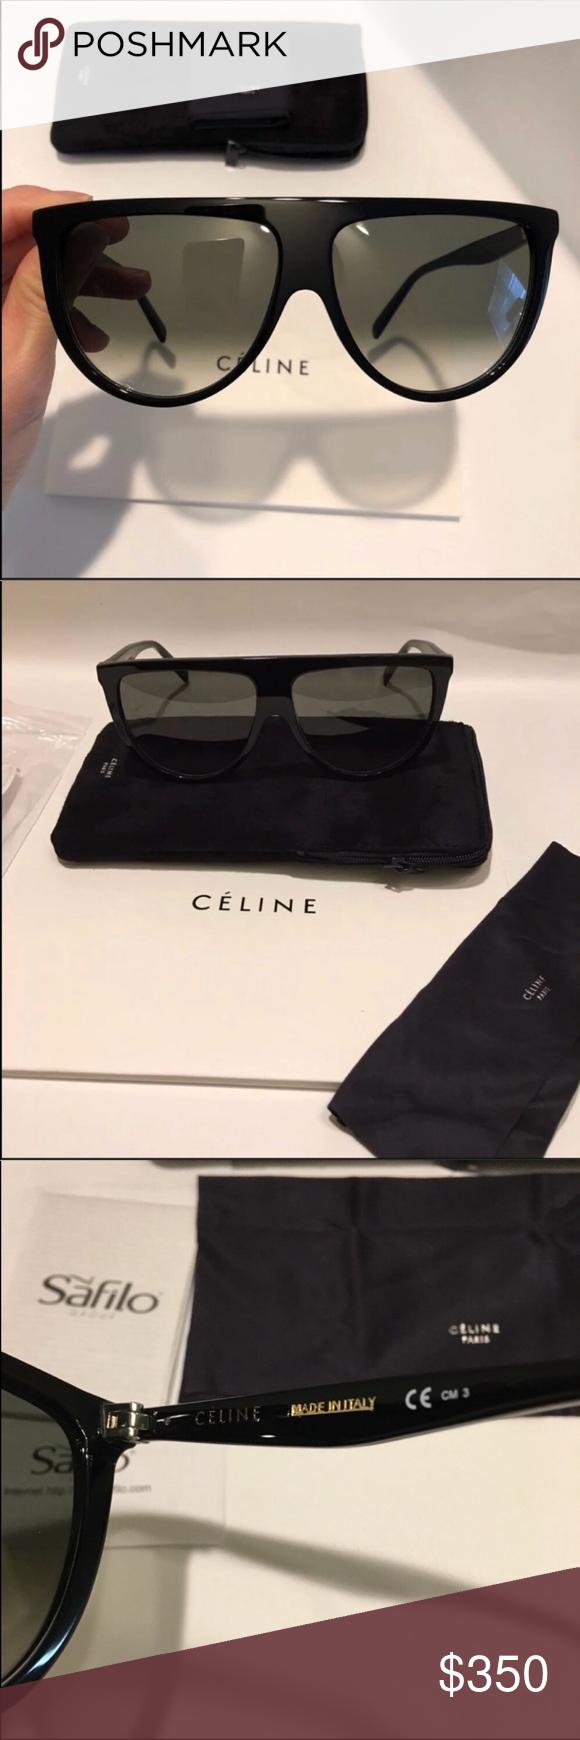 e40b6eaff417 Spotted while shopping on Poshmark  Celine sunglasses 🔥!  poshmark   fashion  shopping